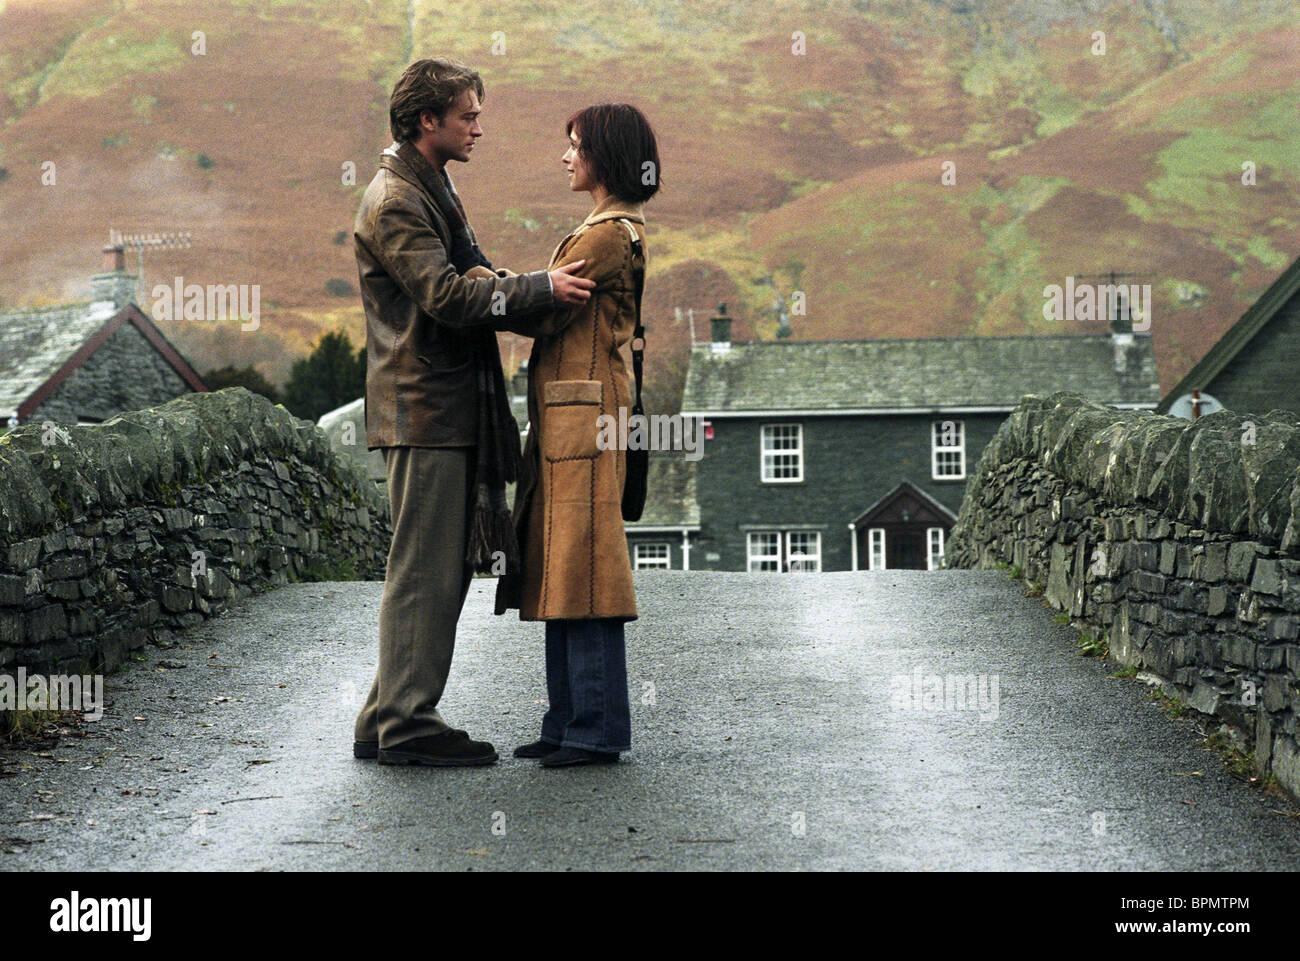 PAUL NICHOLLS & JENNIFER LOVE HEWITT IF ONLY (2004) - Stock Image